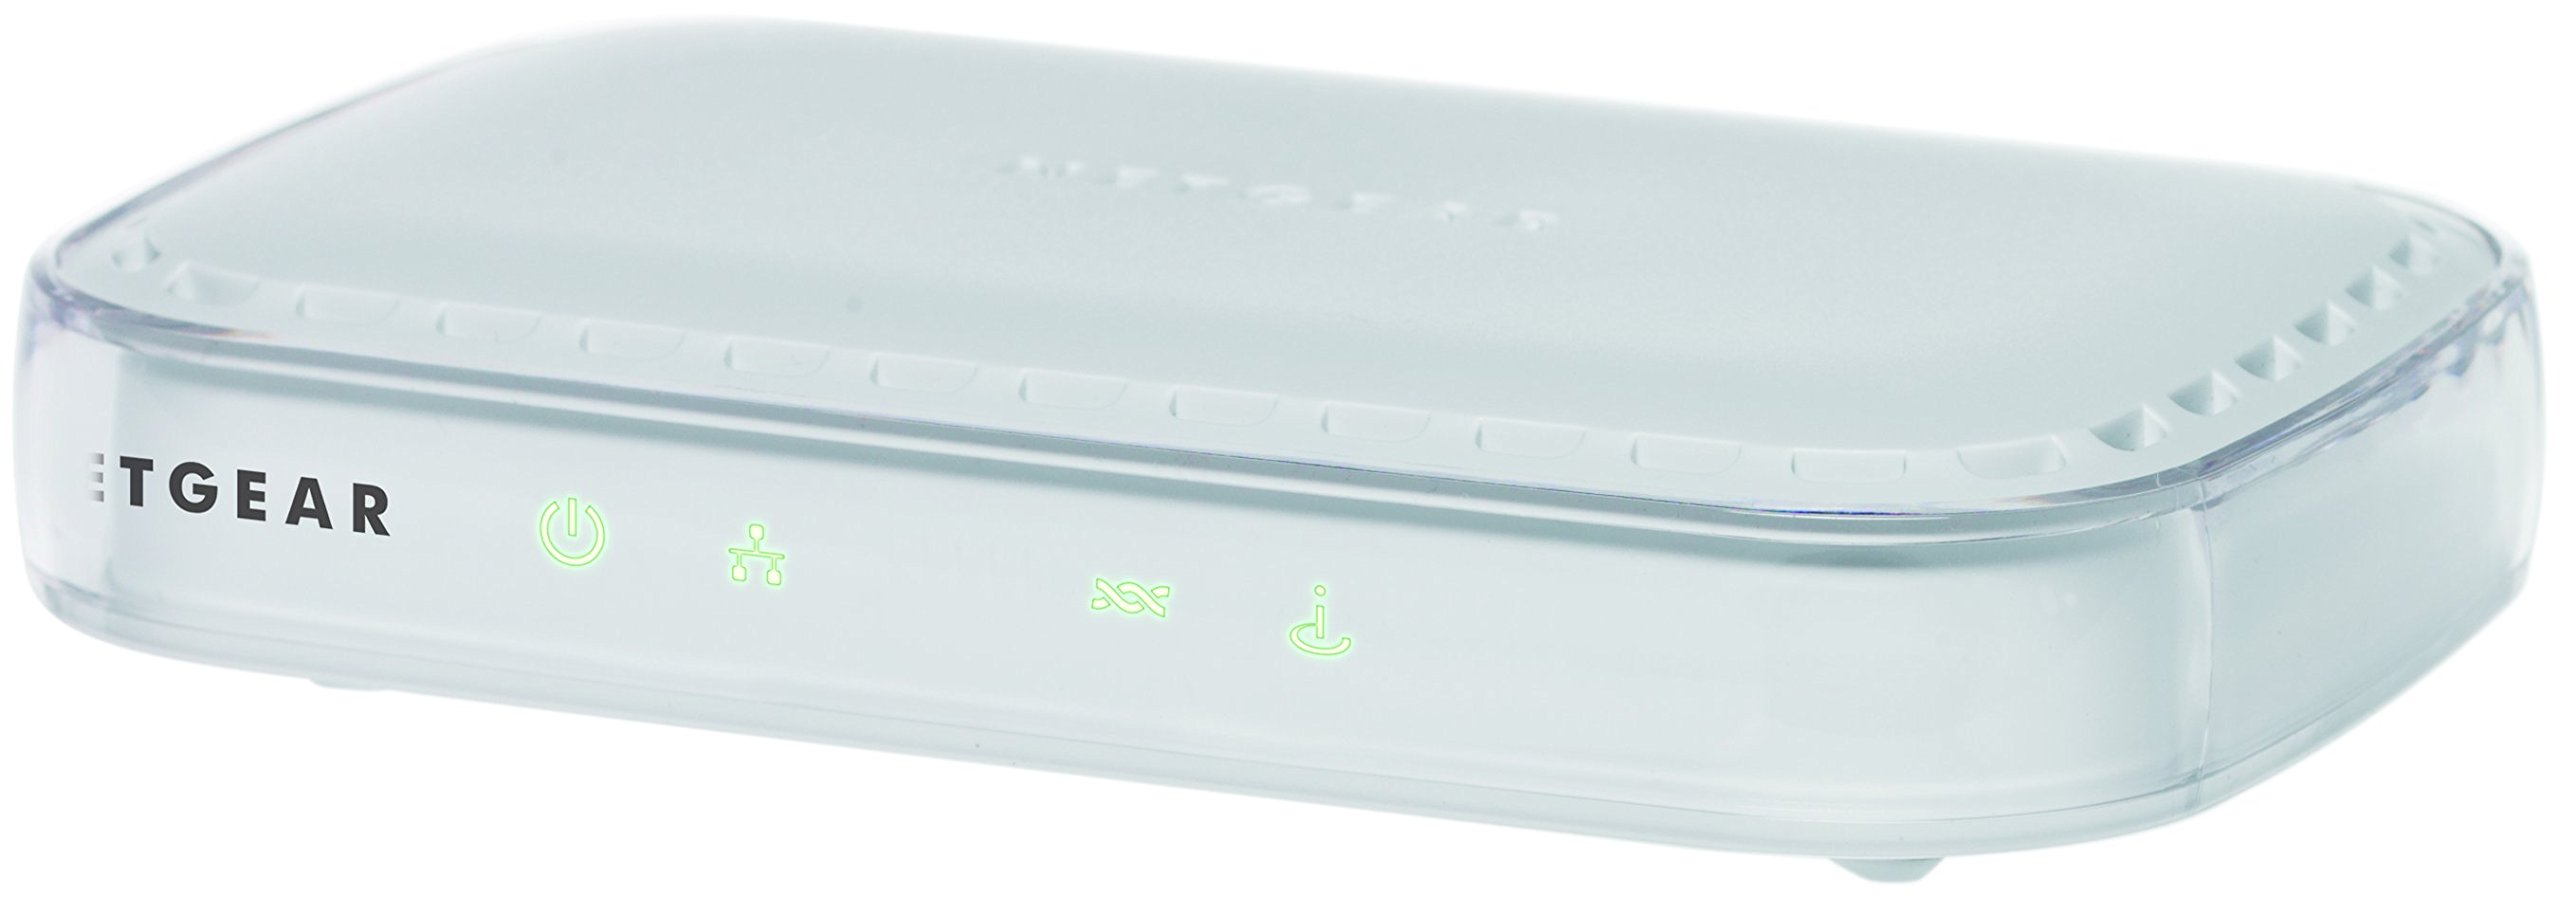 Netgear Broadband ADSL2 Plus Modem (DM111PSP-100NAS) by NETGEAR